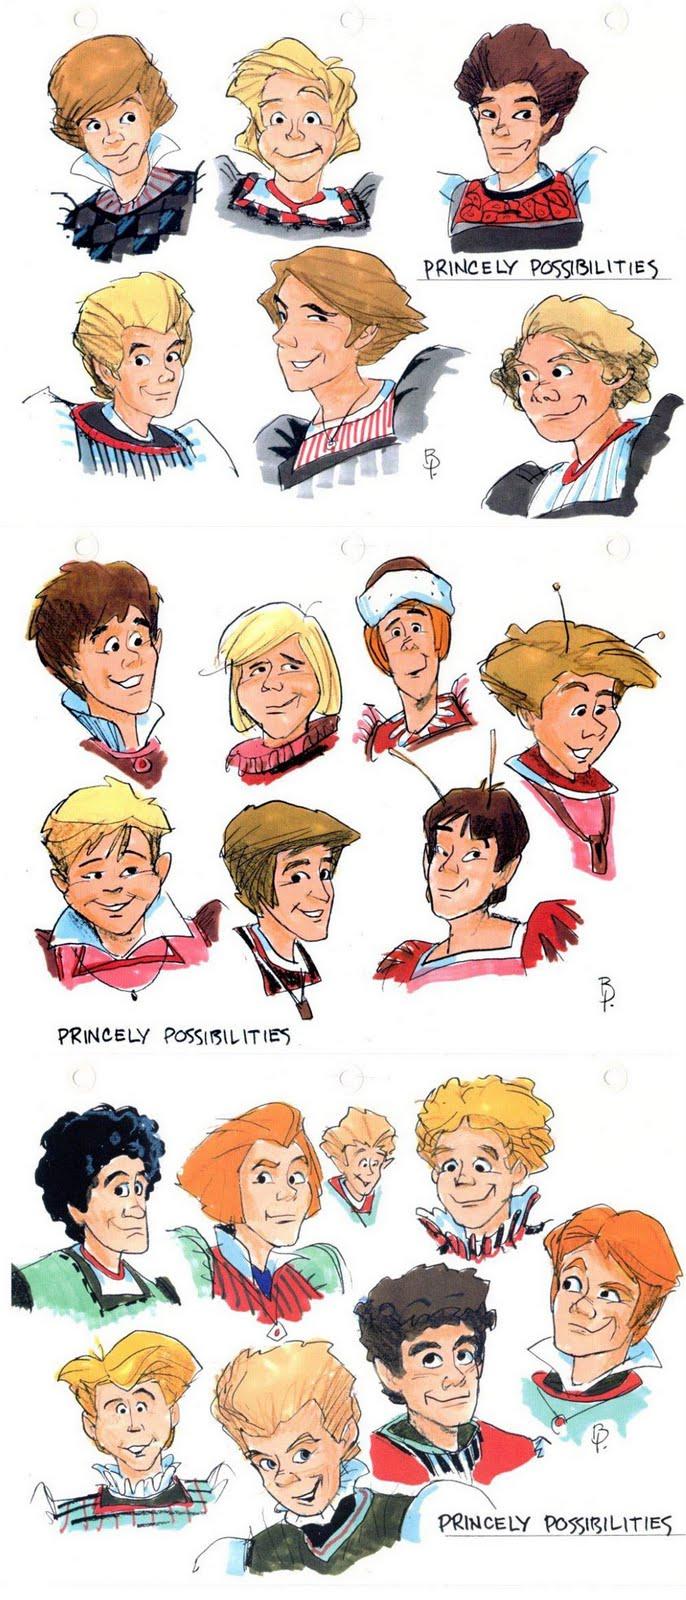 Sekvenskonst: Thumbelina character designs